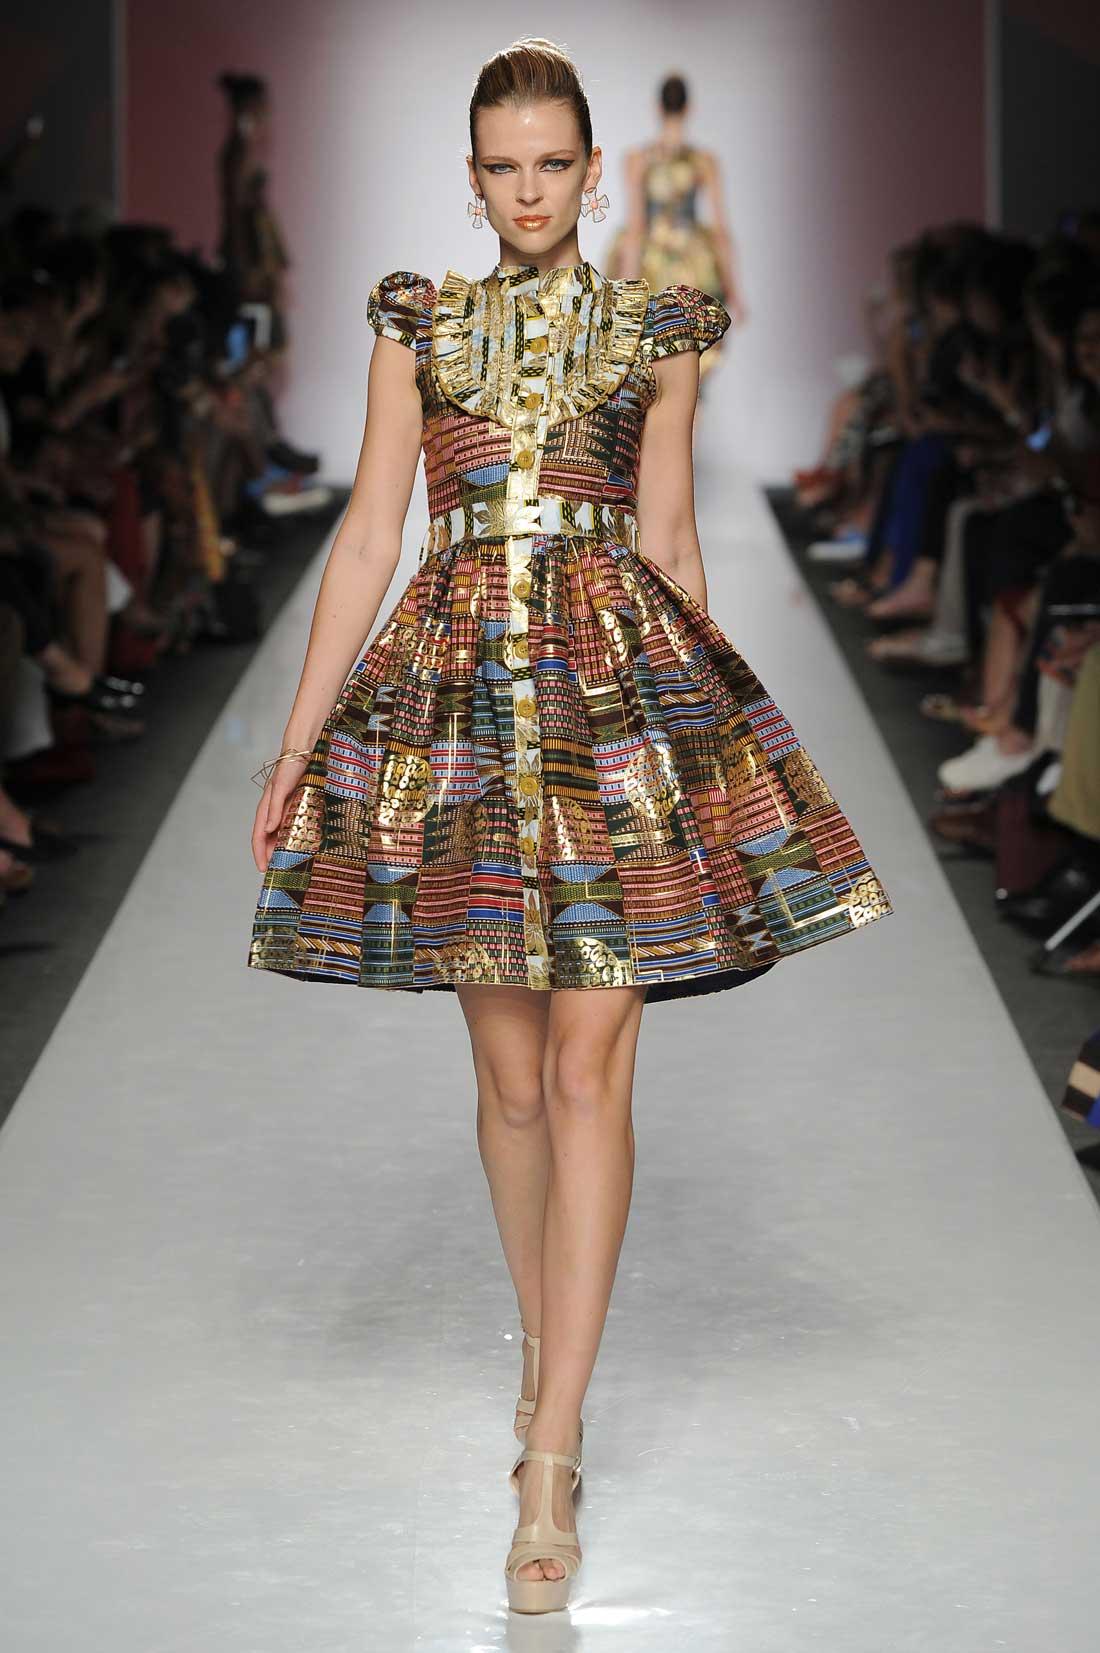 Fashion Dresses Style: Ethical Fashion Initiative